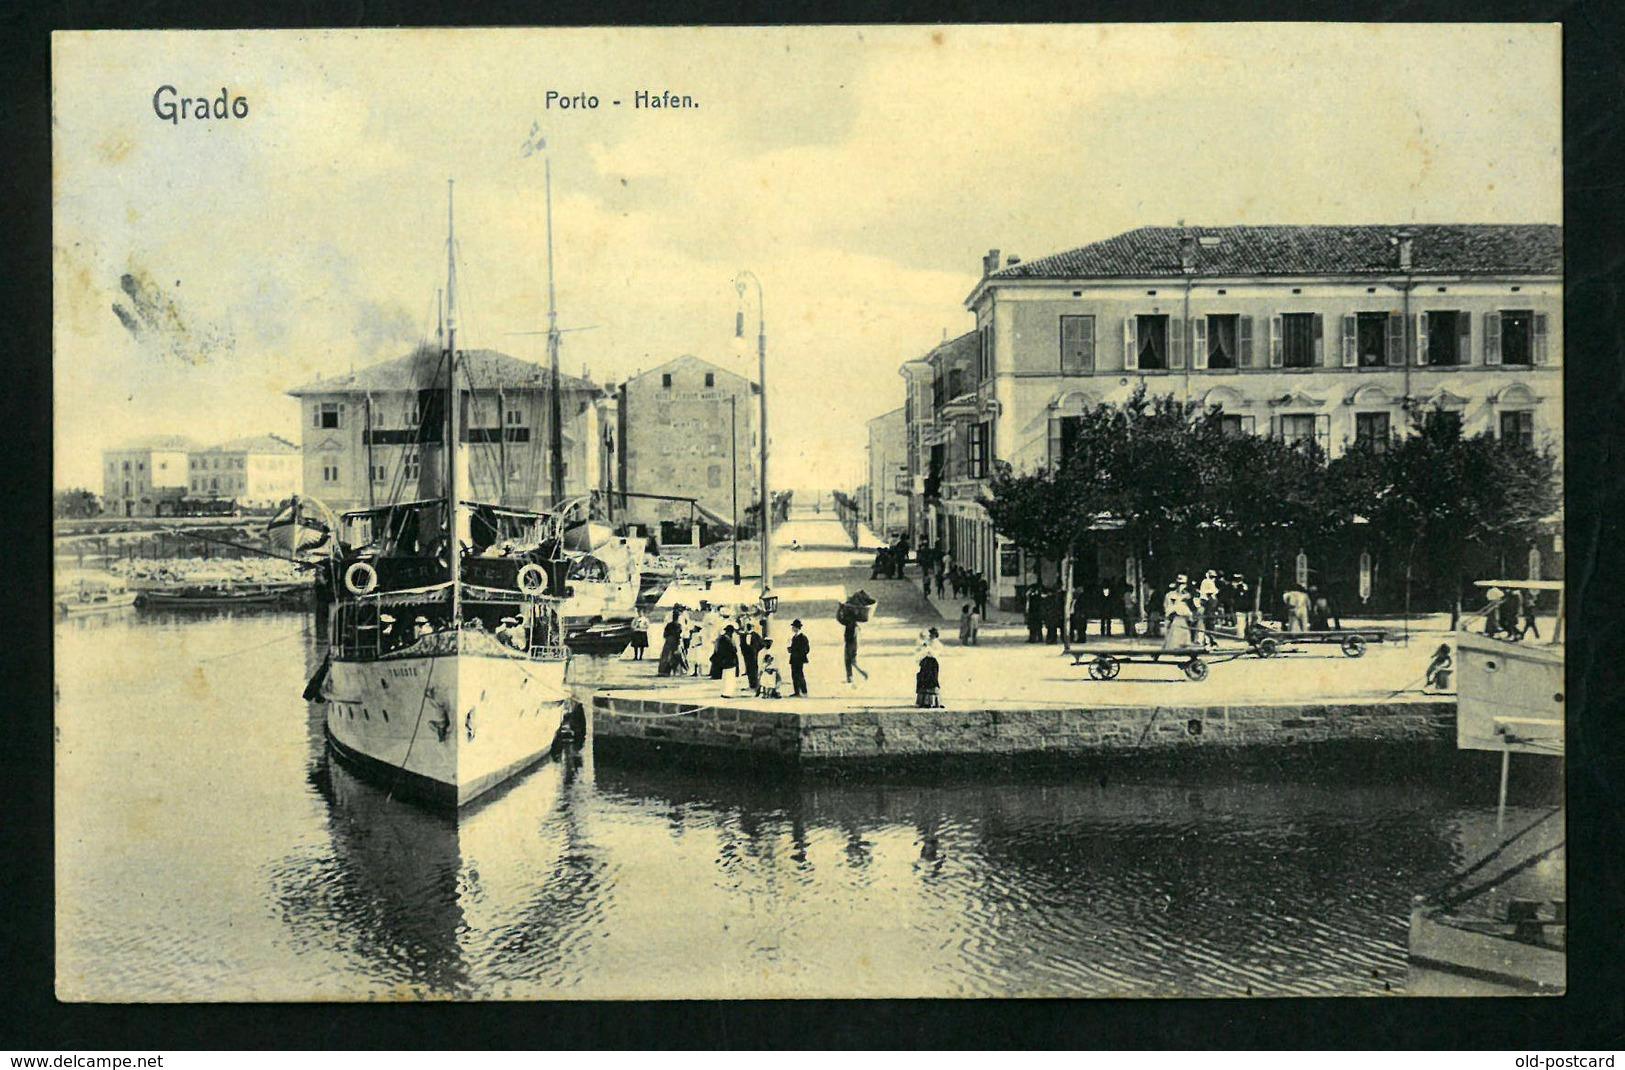 GRADO  PORTO HAFEN  1909  AUSTRIA   VF   POSTCARD - Autriche